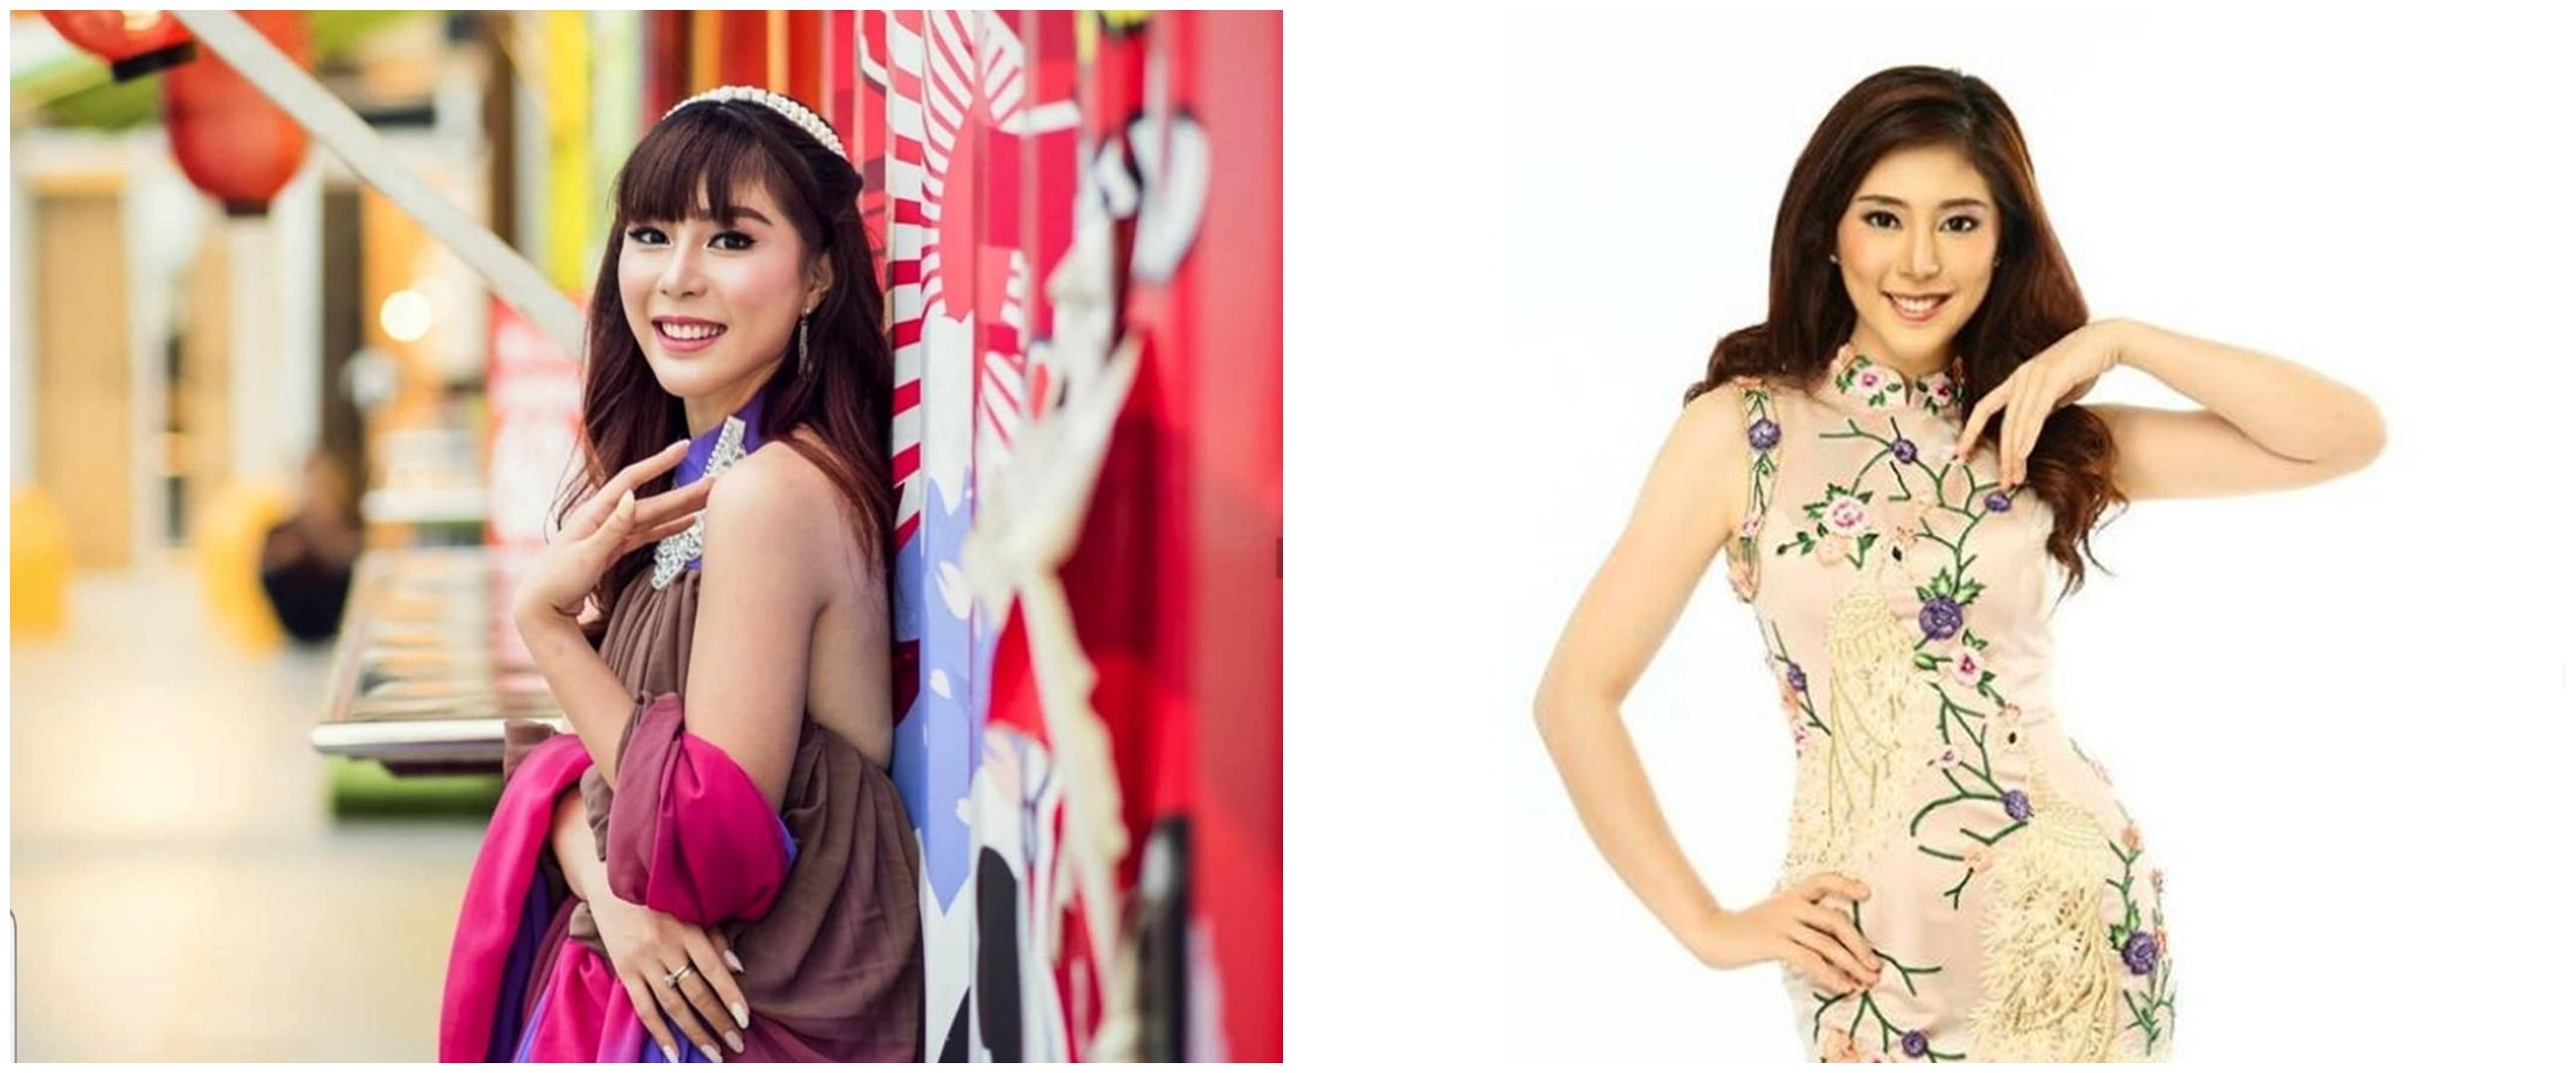 10 Pesona Jessy Silana, Putri Pariwisata Indonesia 2020